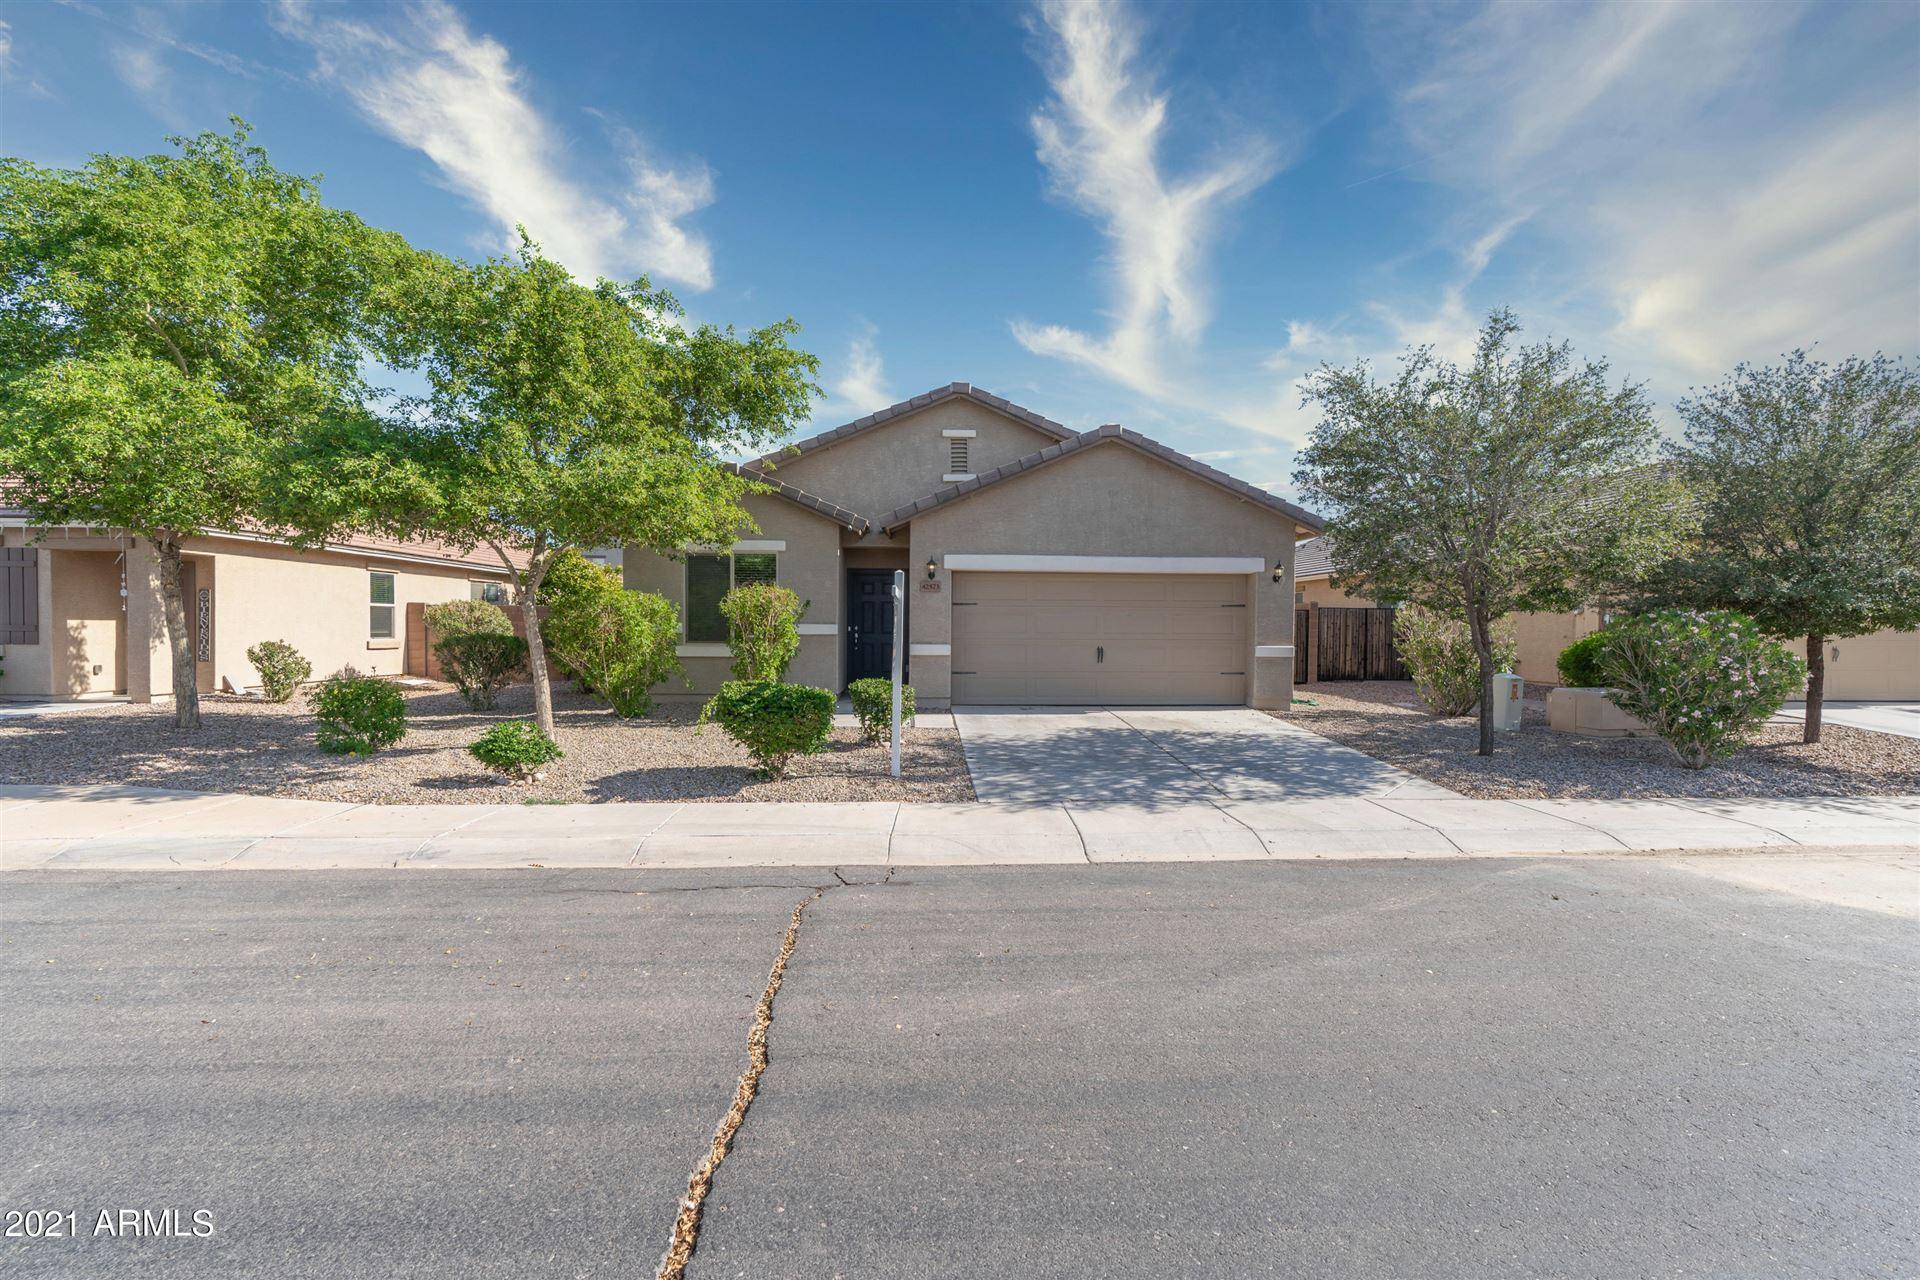 42573 W Sussex Road, Maricopa, AZ 85138 - MLS#: 6258049